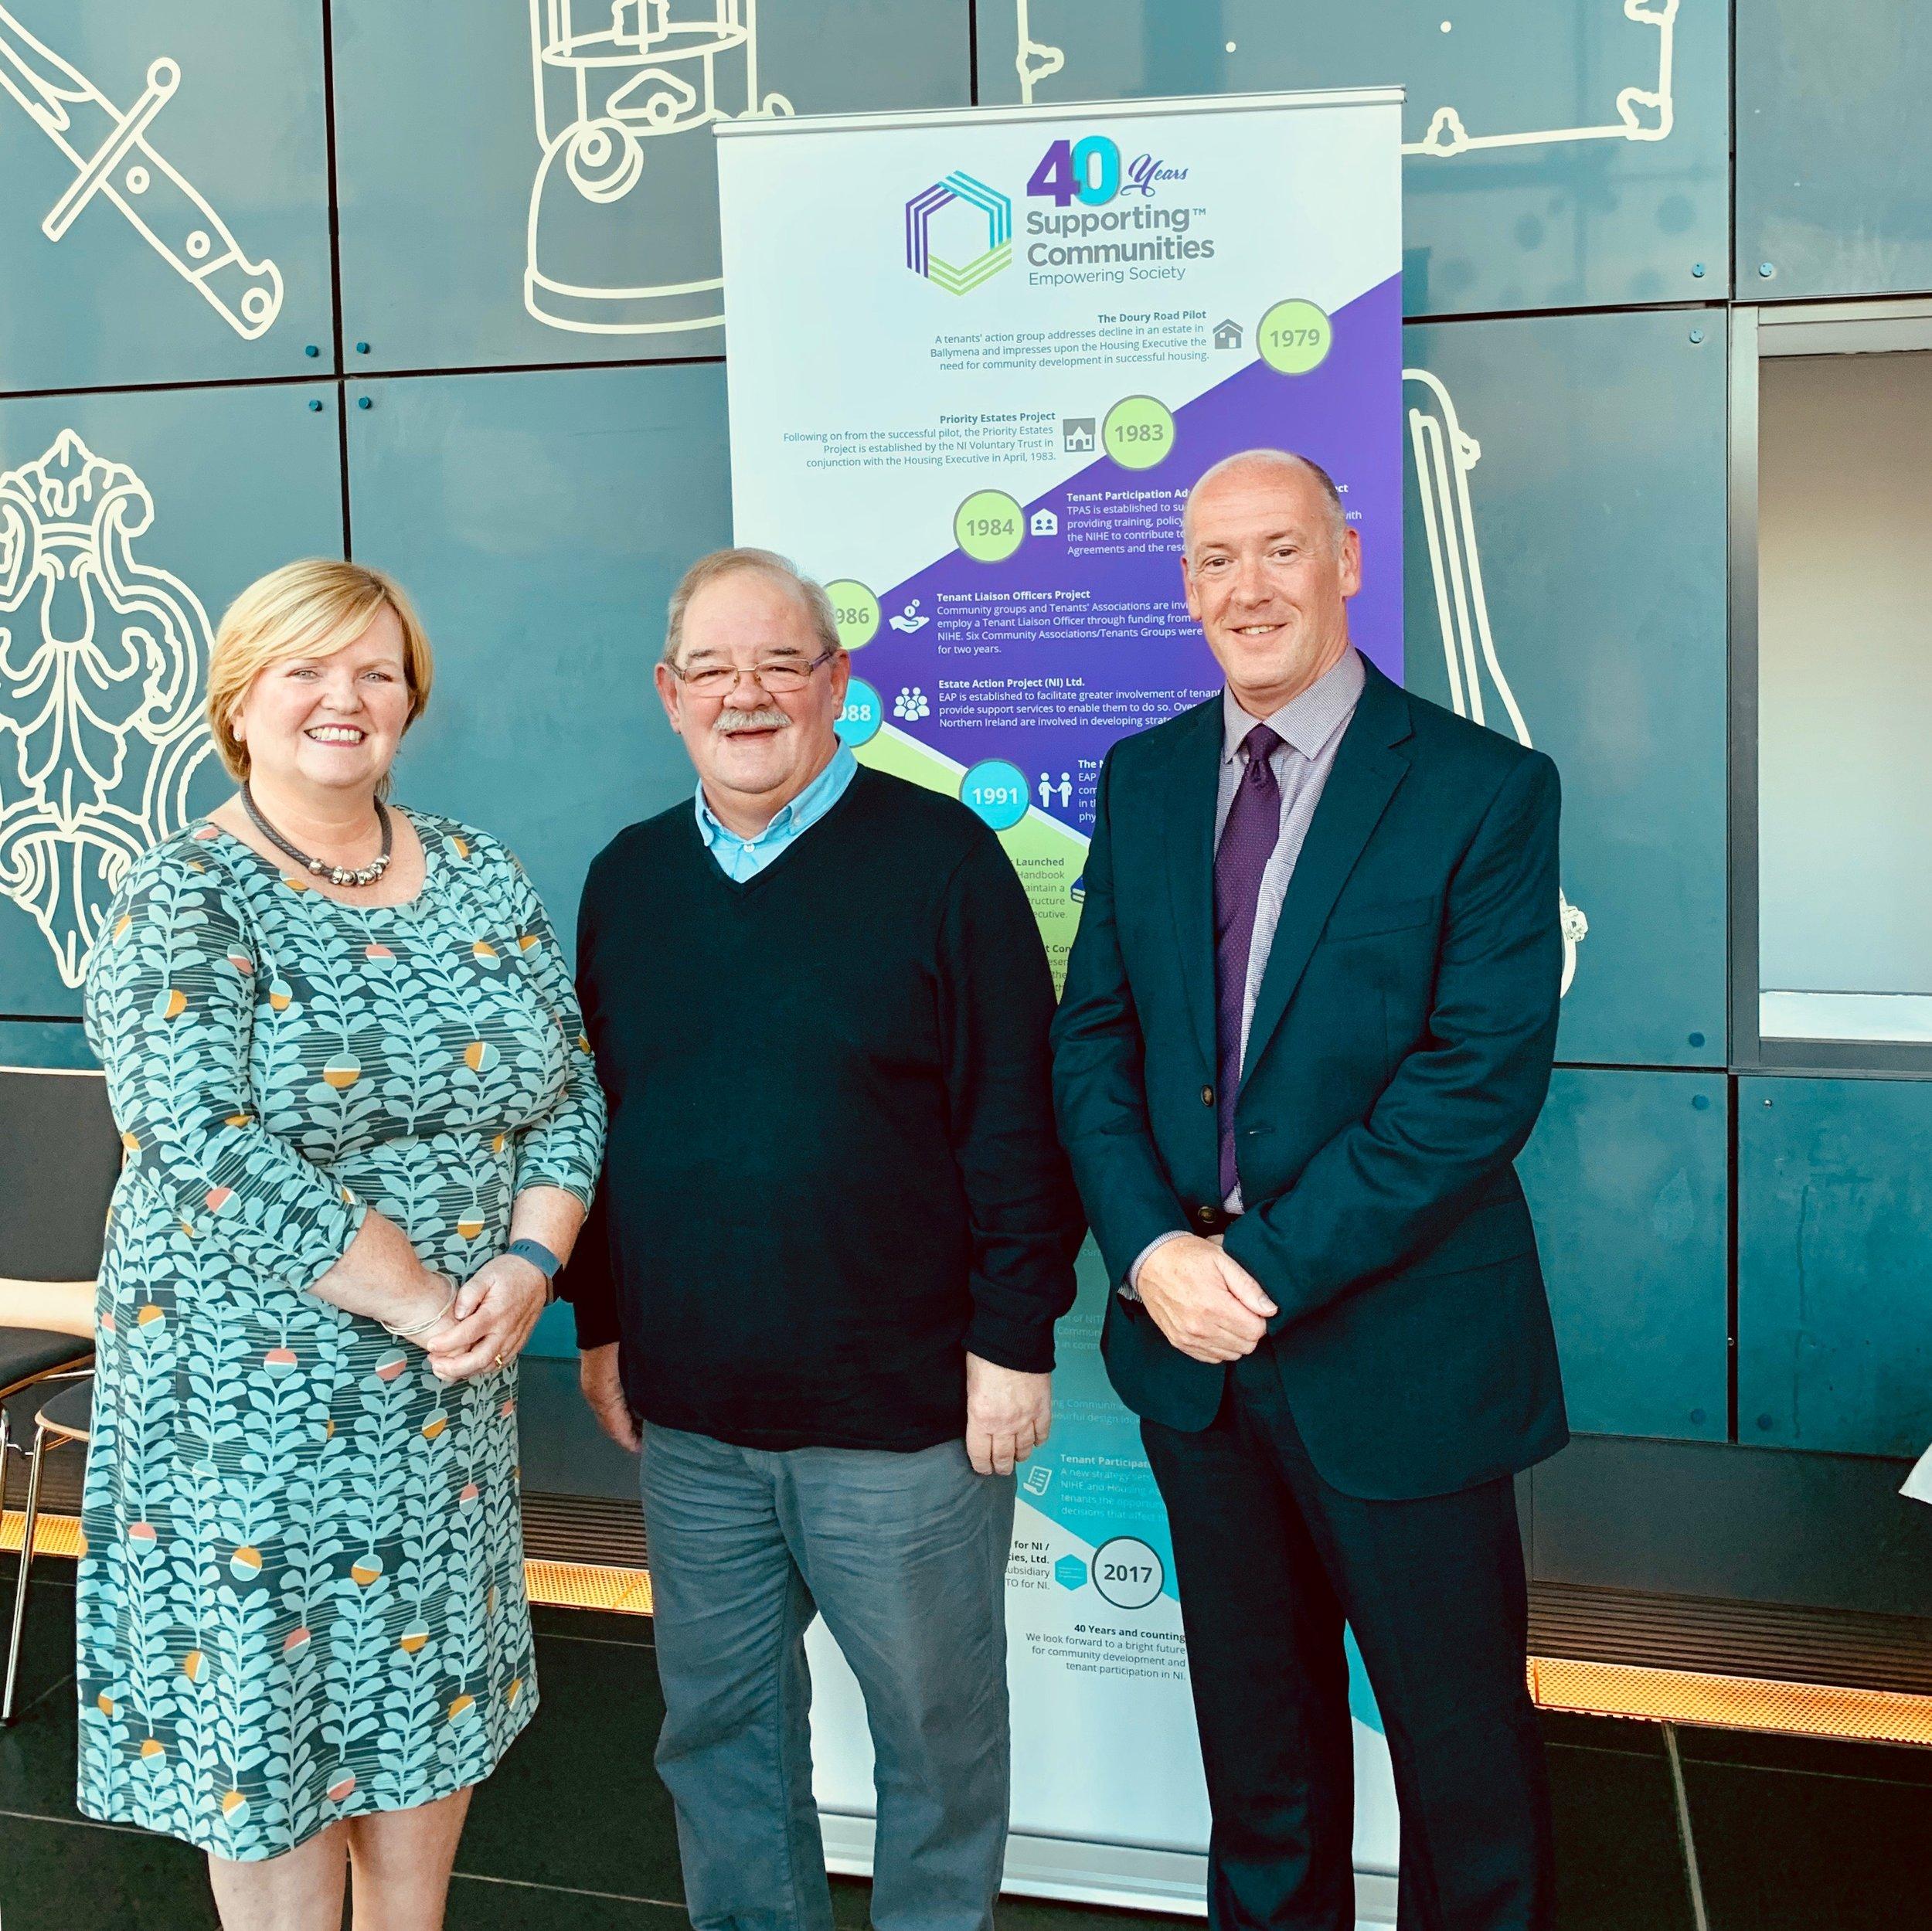 Theresa Patton, Brian Holmes and Colm McDaid